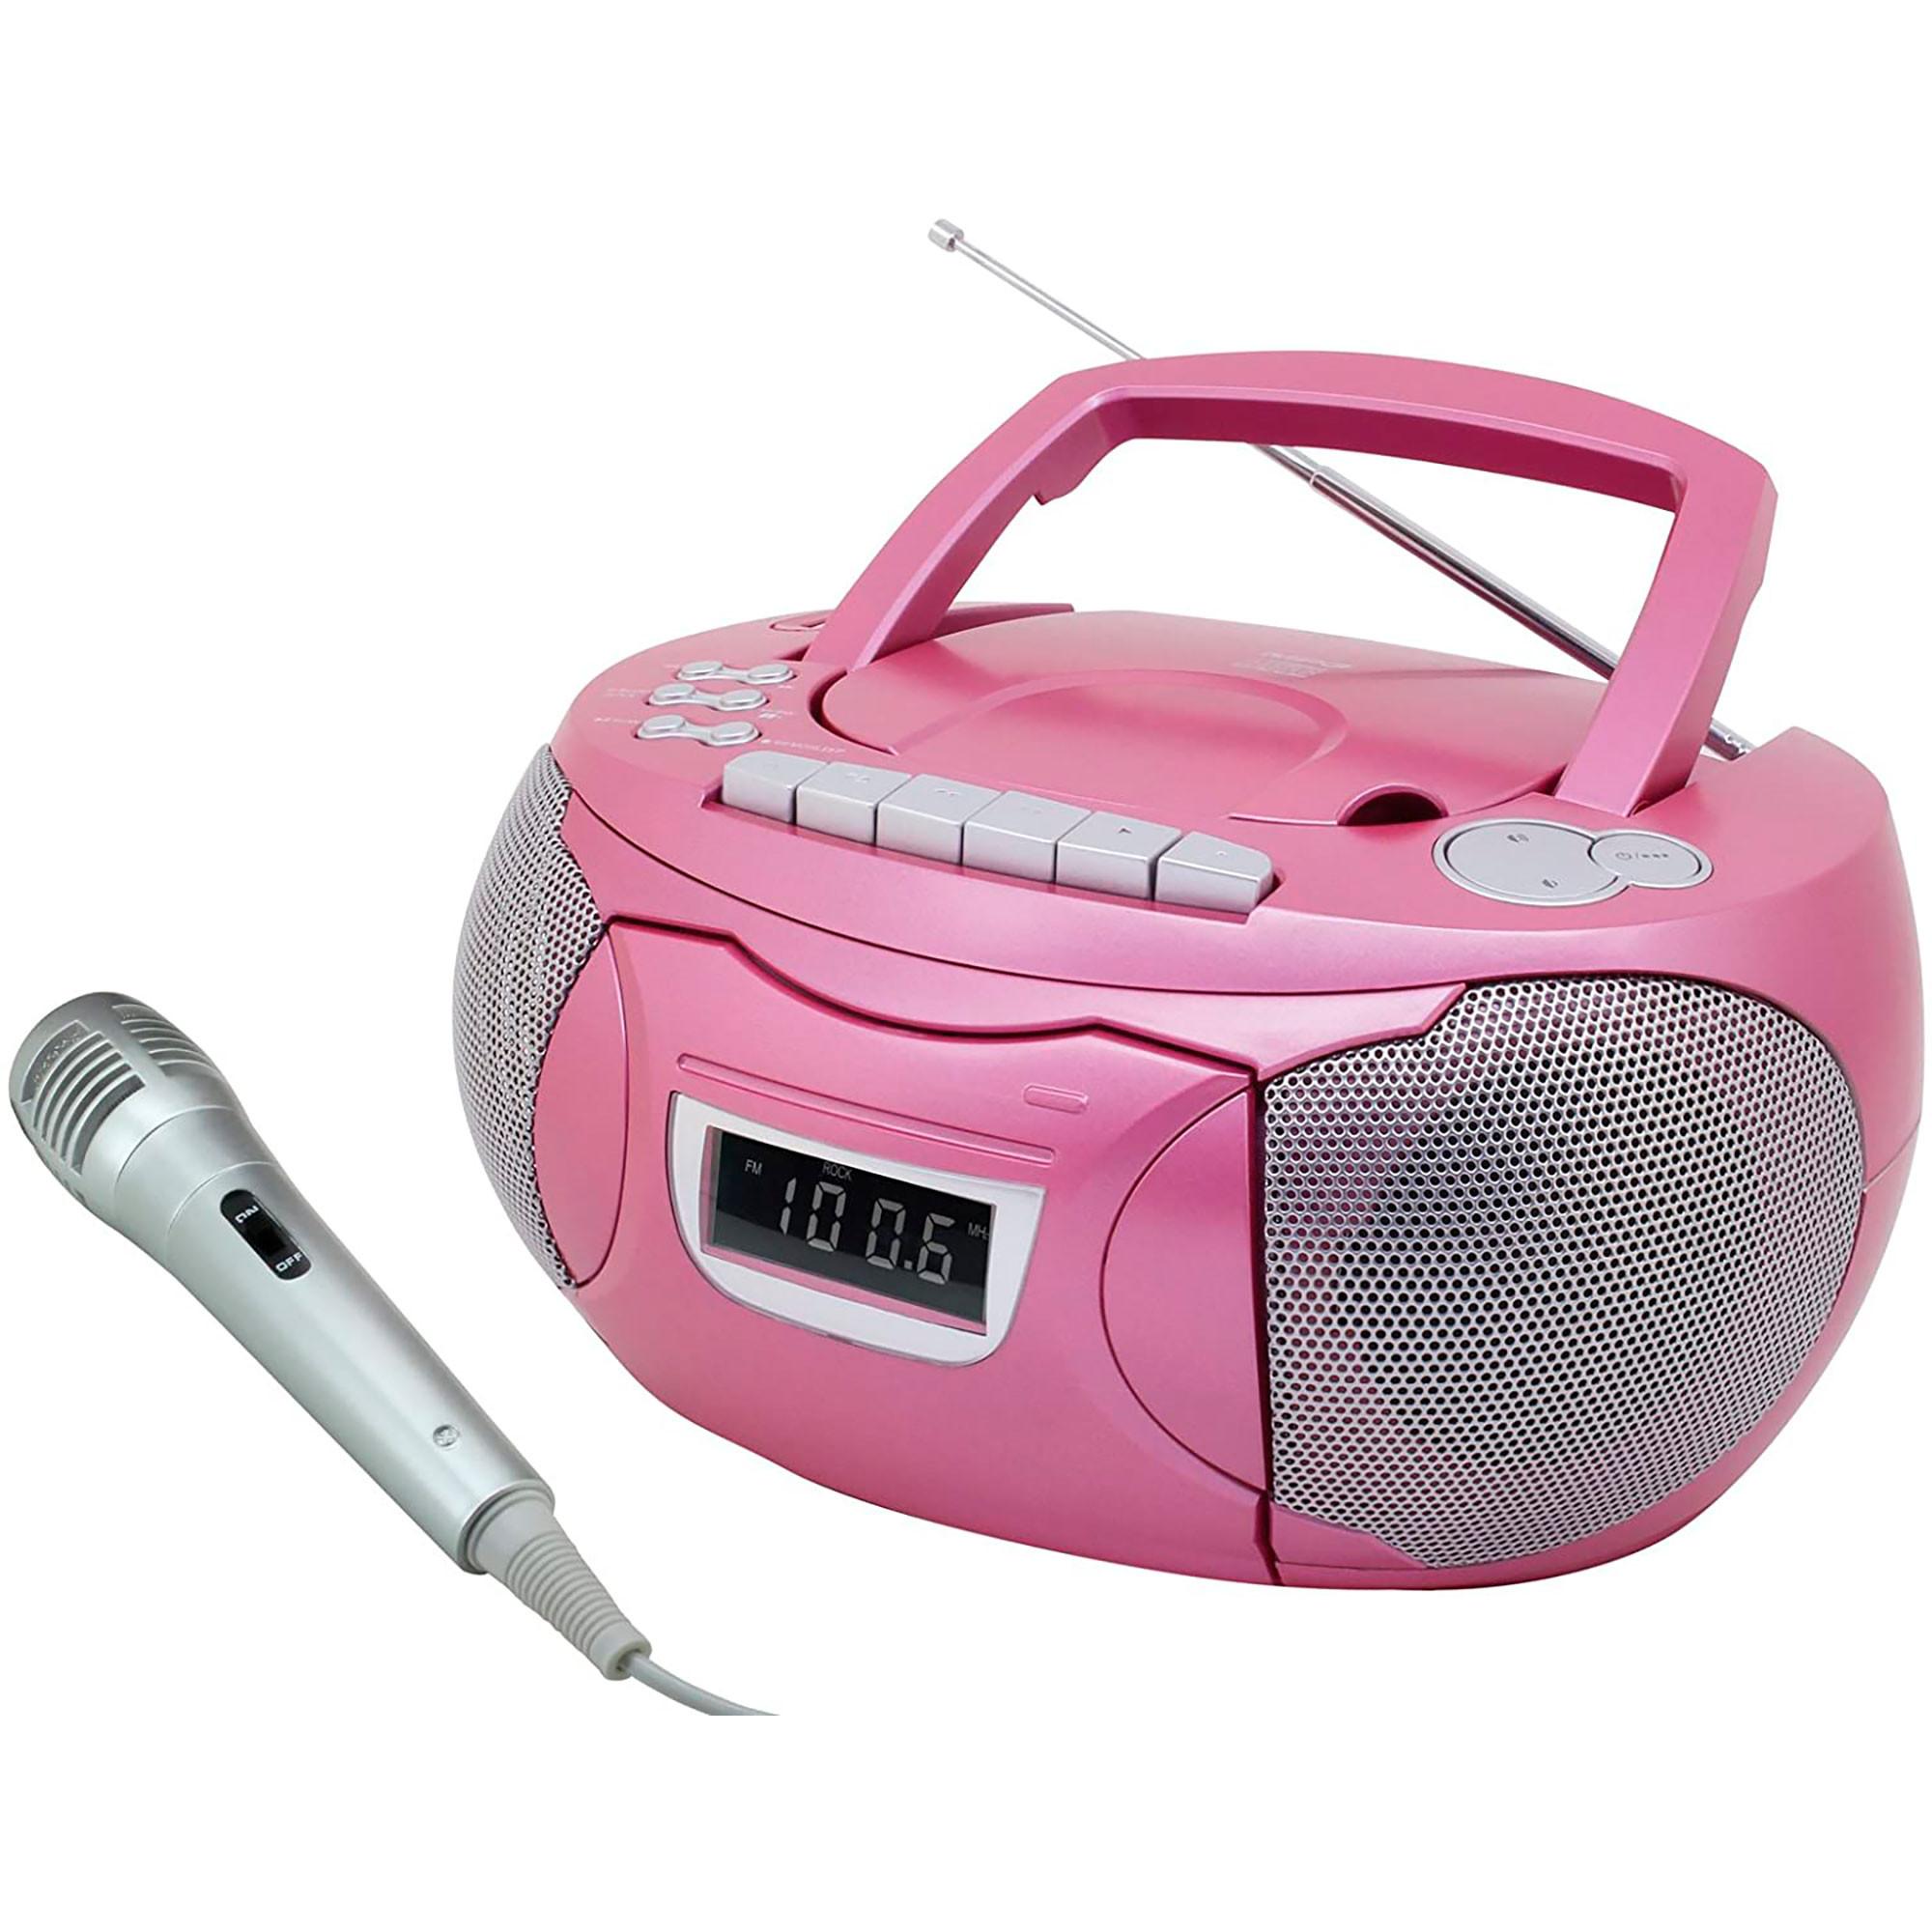 Soundmaster SCD5750PI Radio Karaoke FM, Reproductor CD, Cassette, USB, MP3, Micrófono, Portátil, Rosa